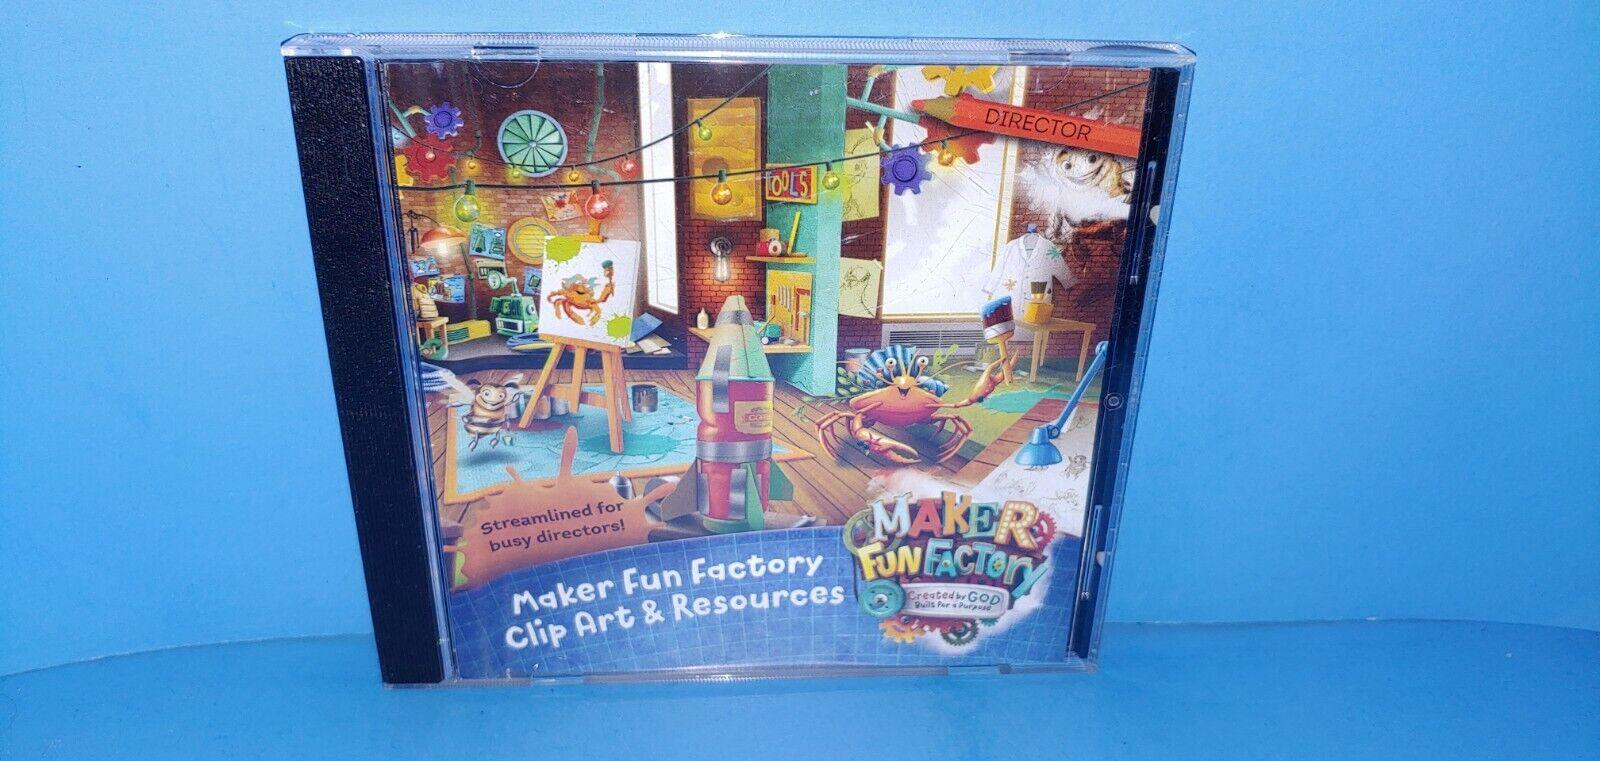 Maker Fun Factory Clip Art Resources CD ROM WINDOWS/MAC 2017 VBS B402 - $149.99